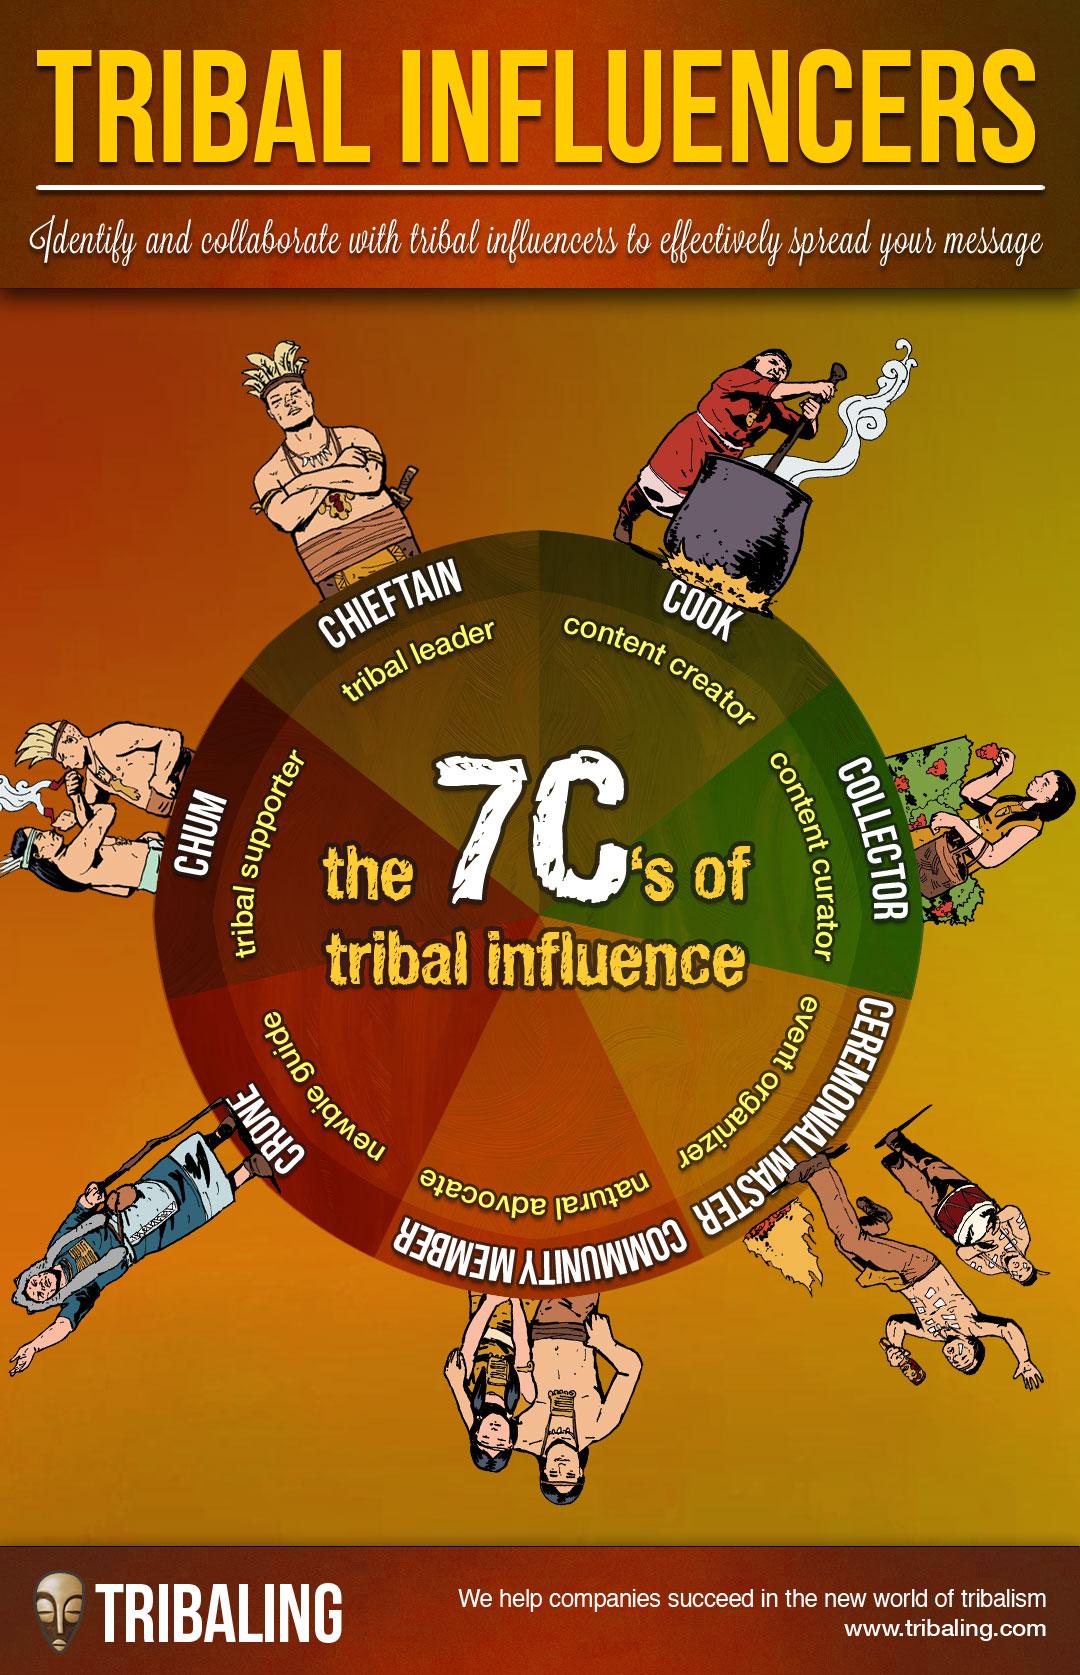 Source: Tribaling.com